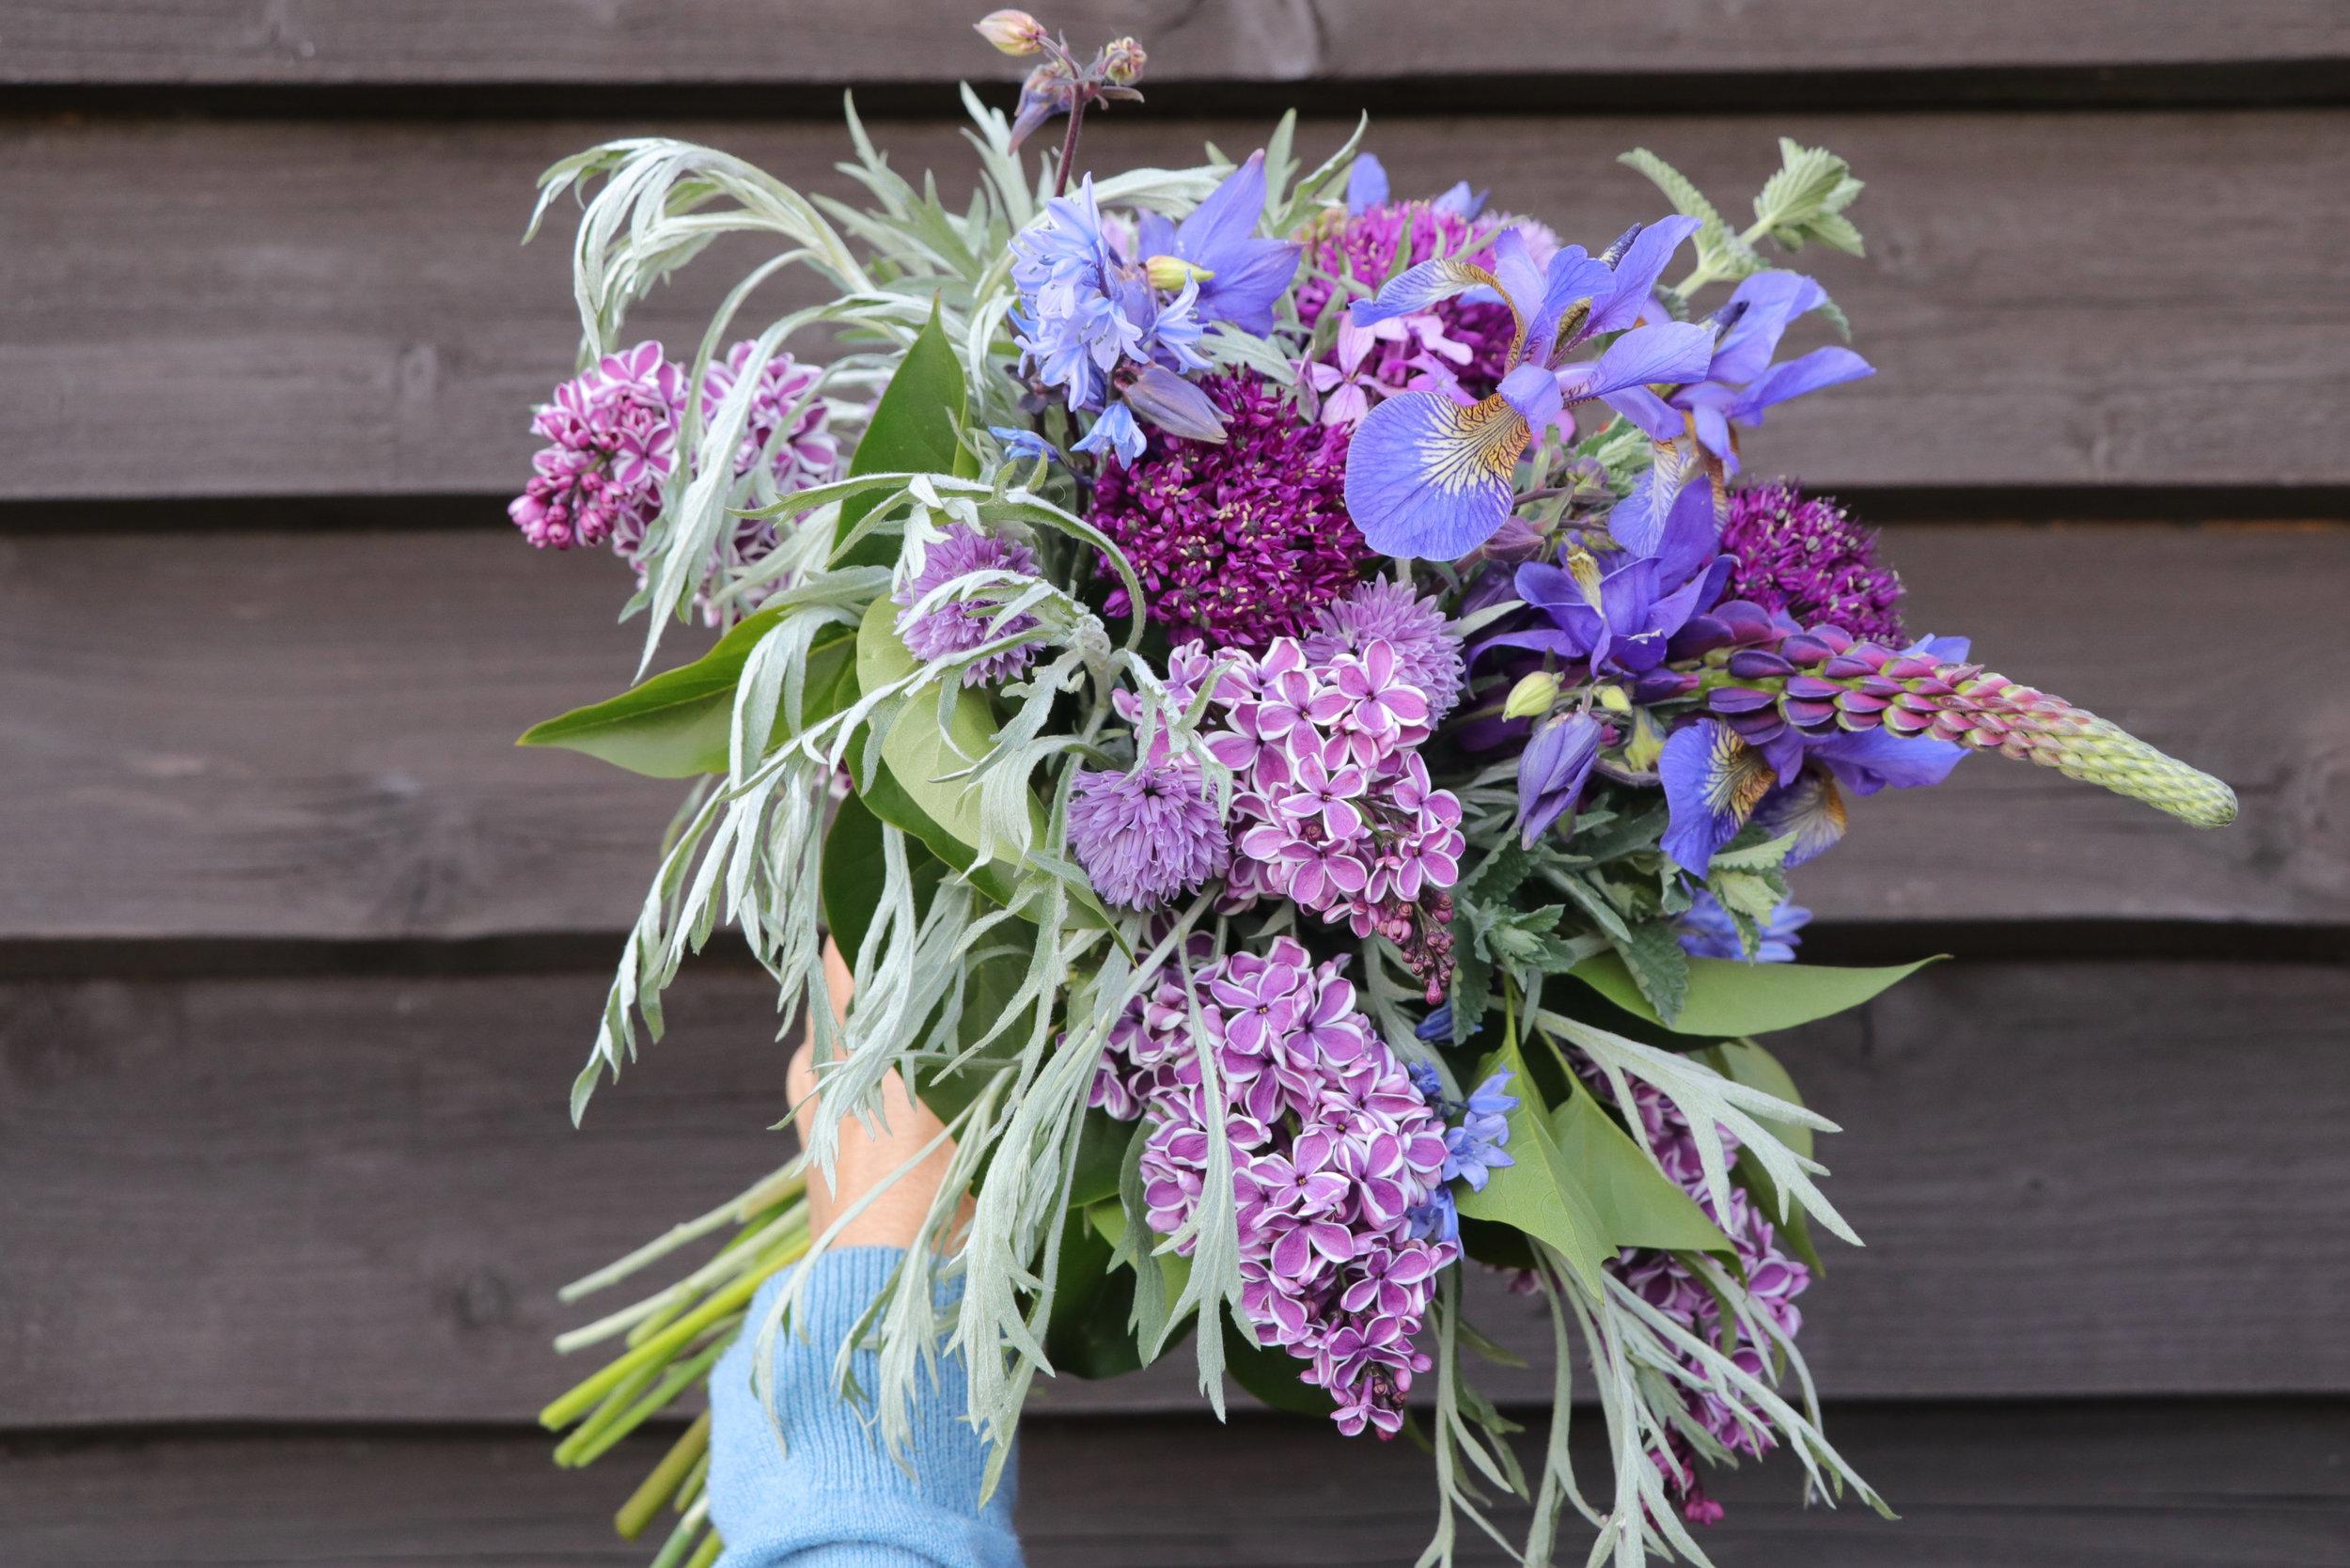 lush lilac purple sensation spring bouquet.jpg